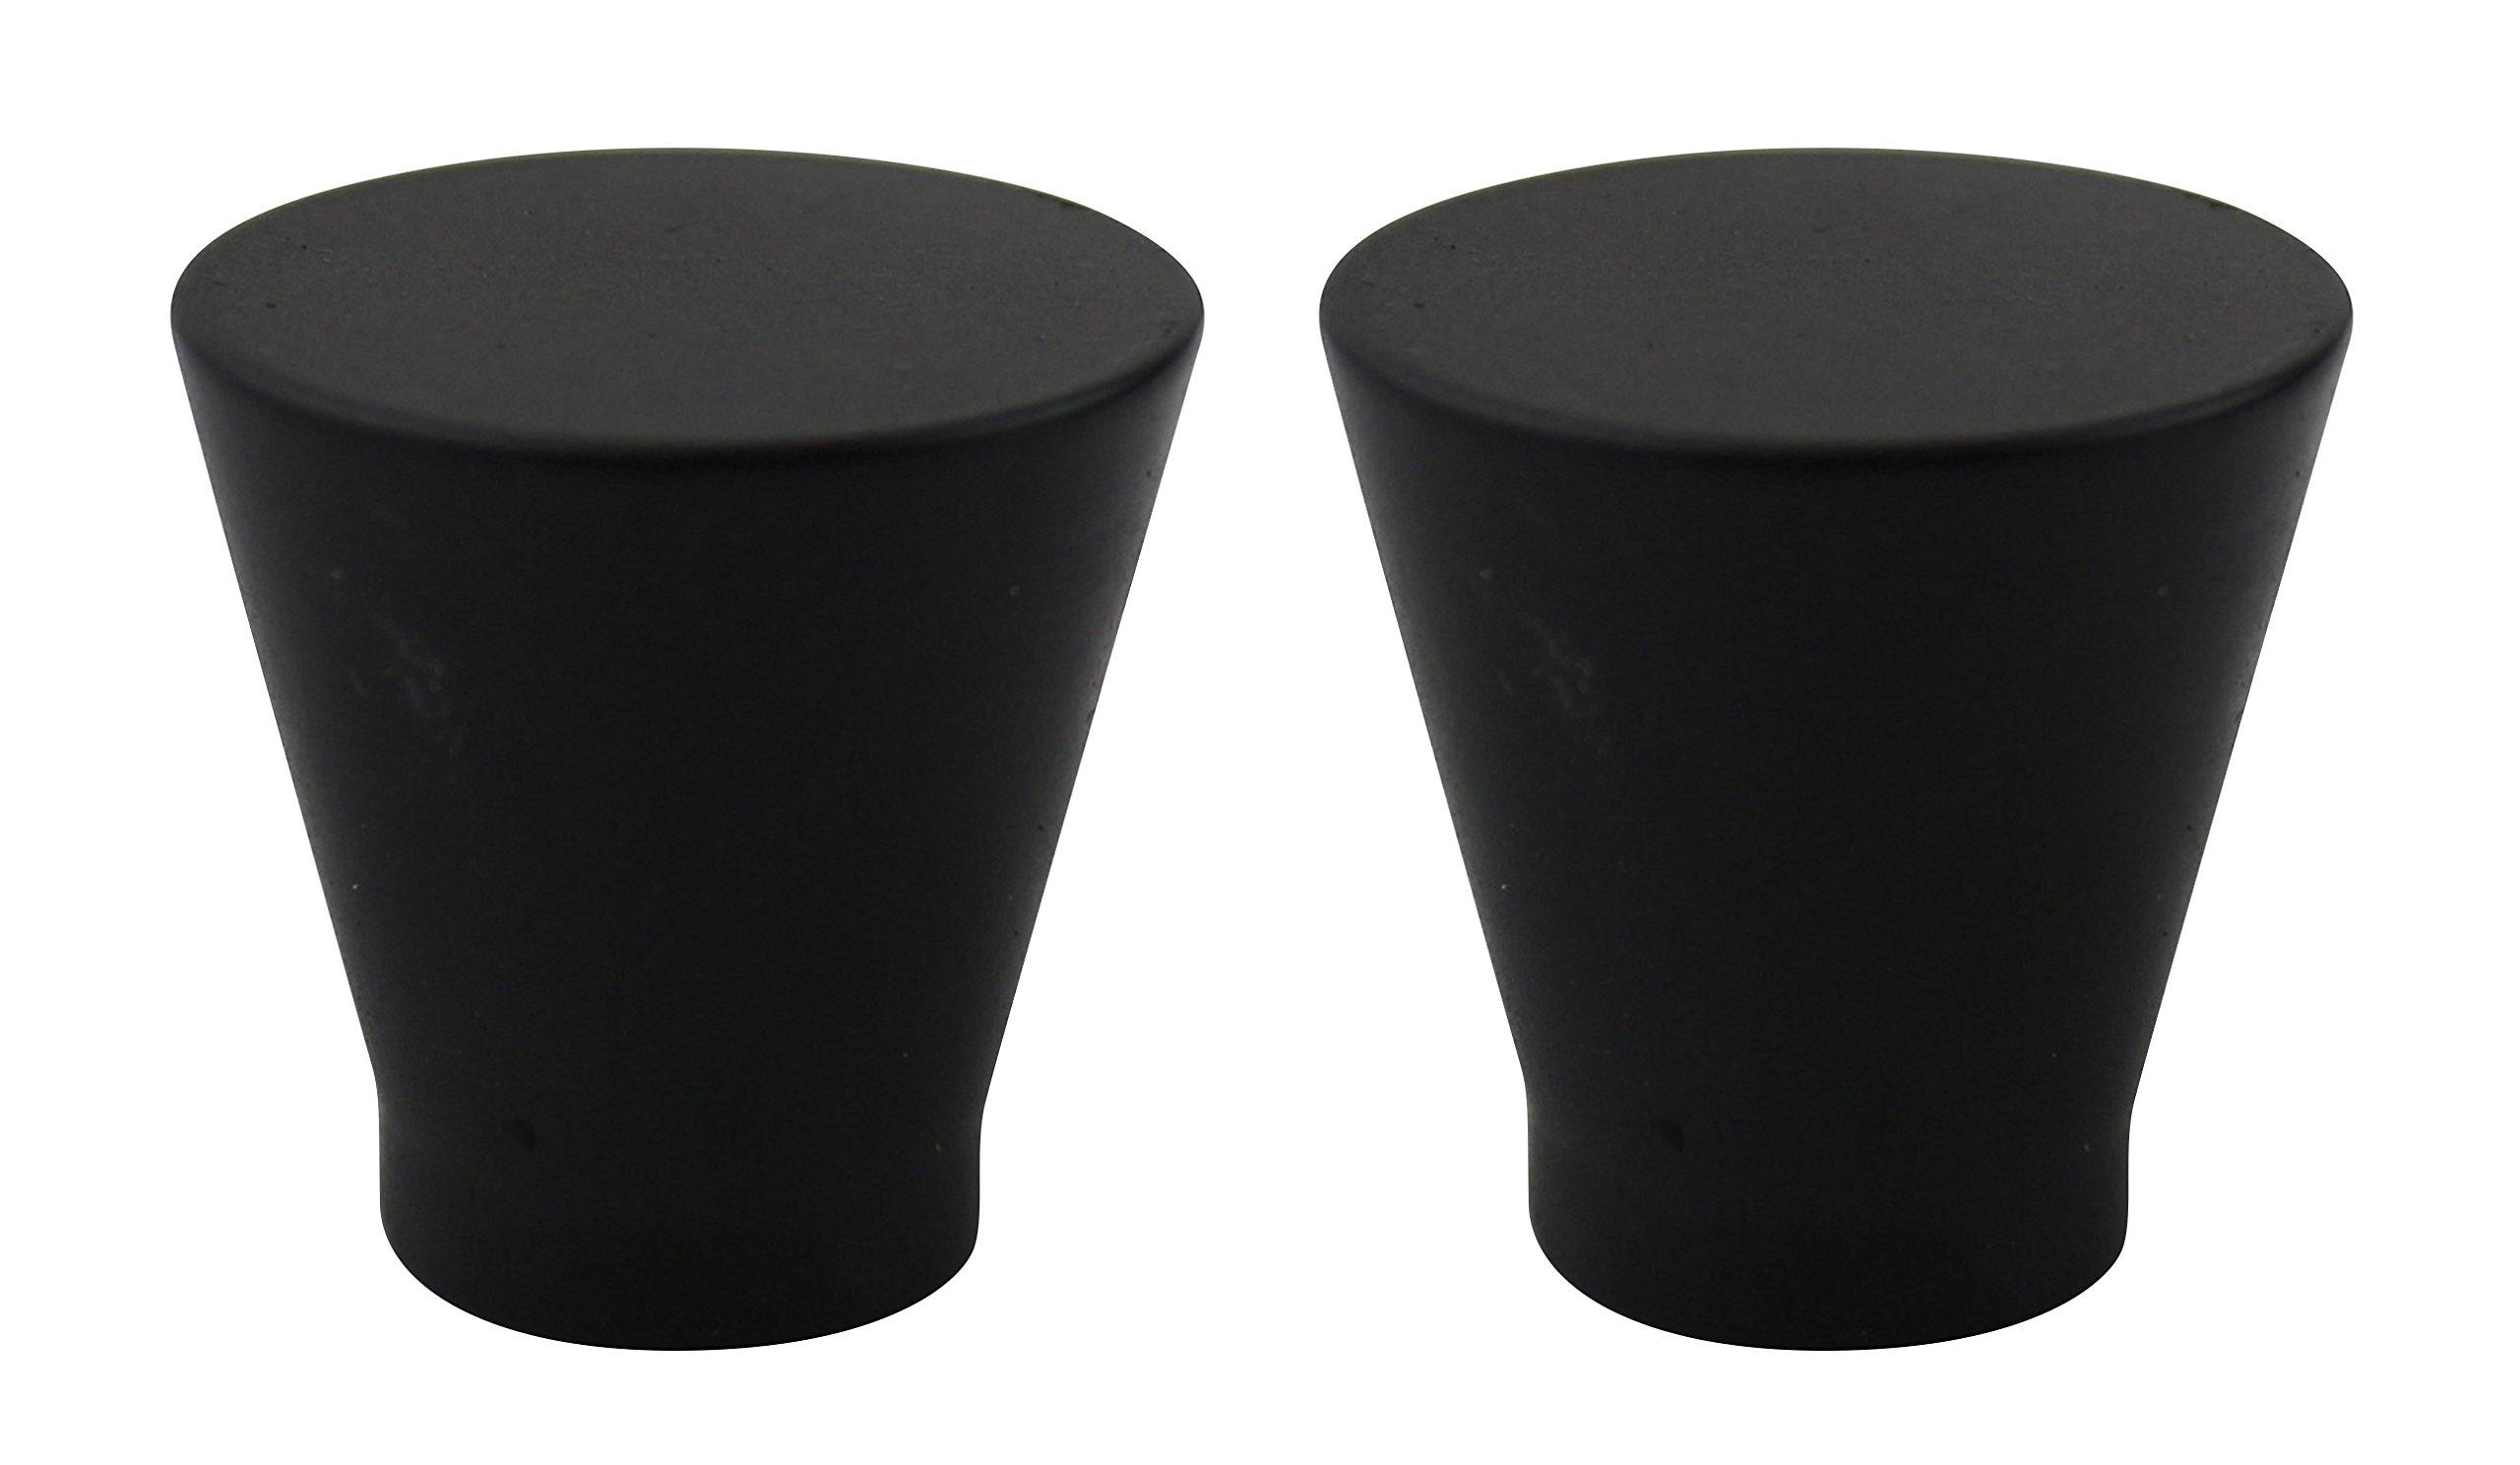 Urbanest Set of 2 Rino Lamp Finial, 1-inch Tall, Black